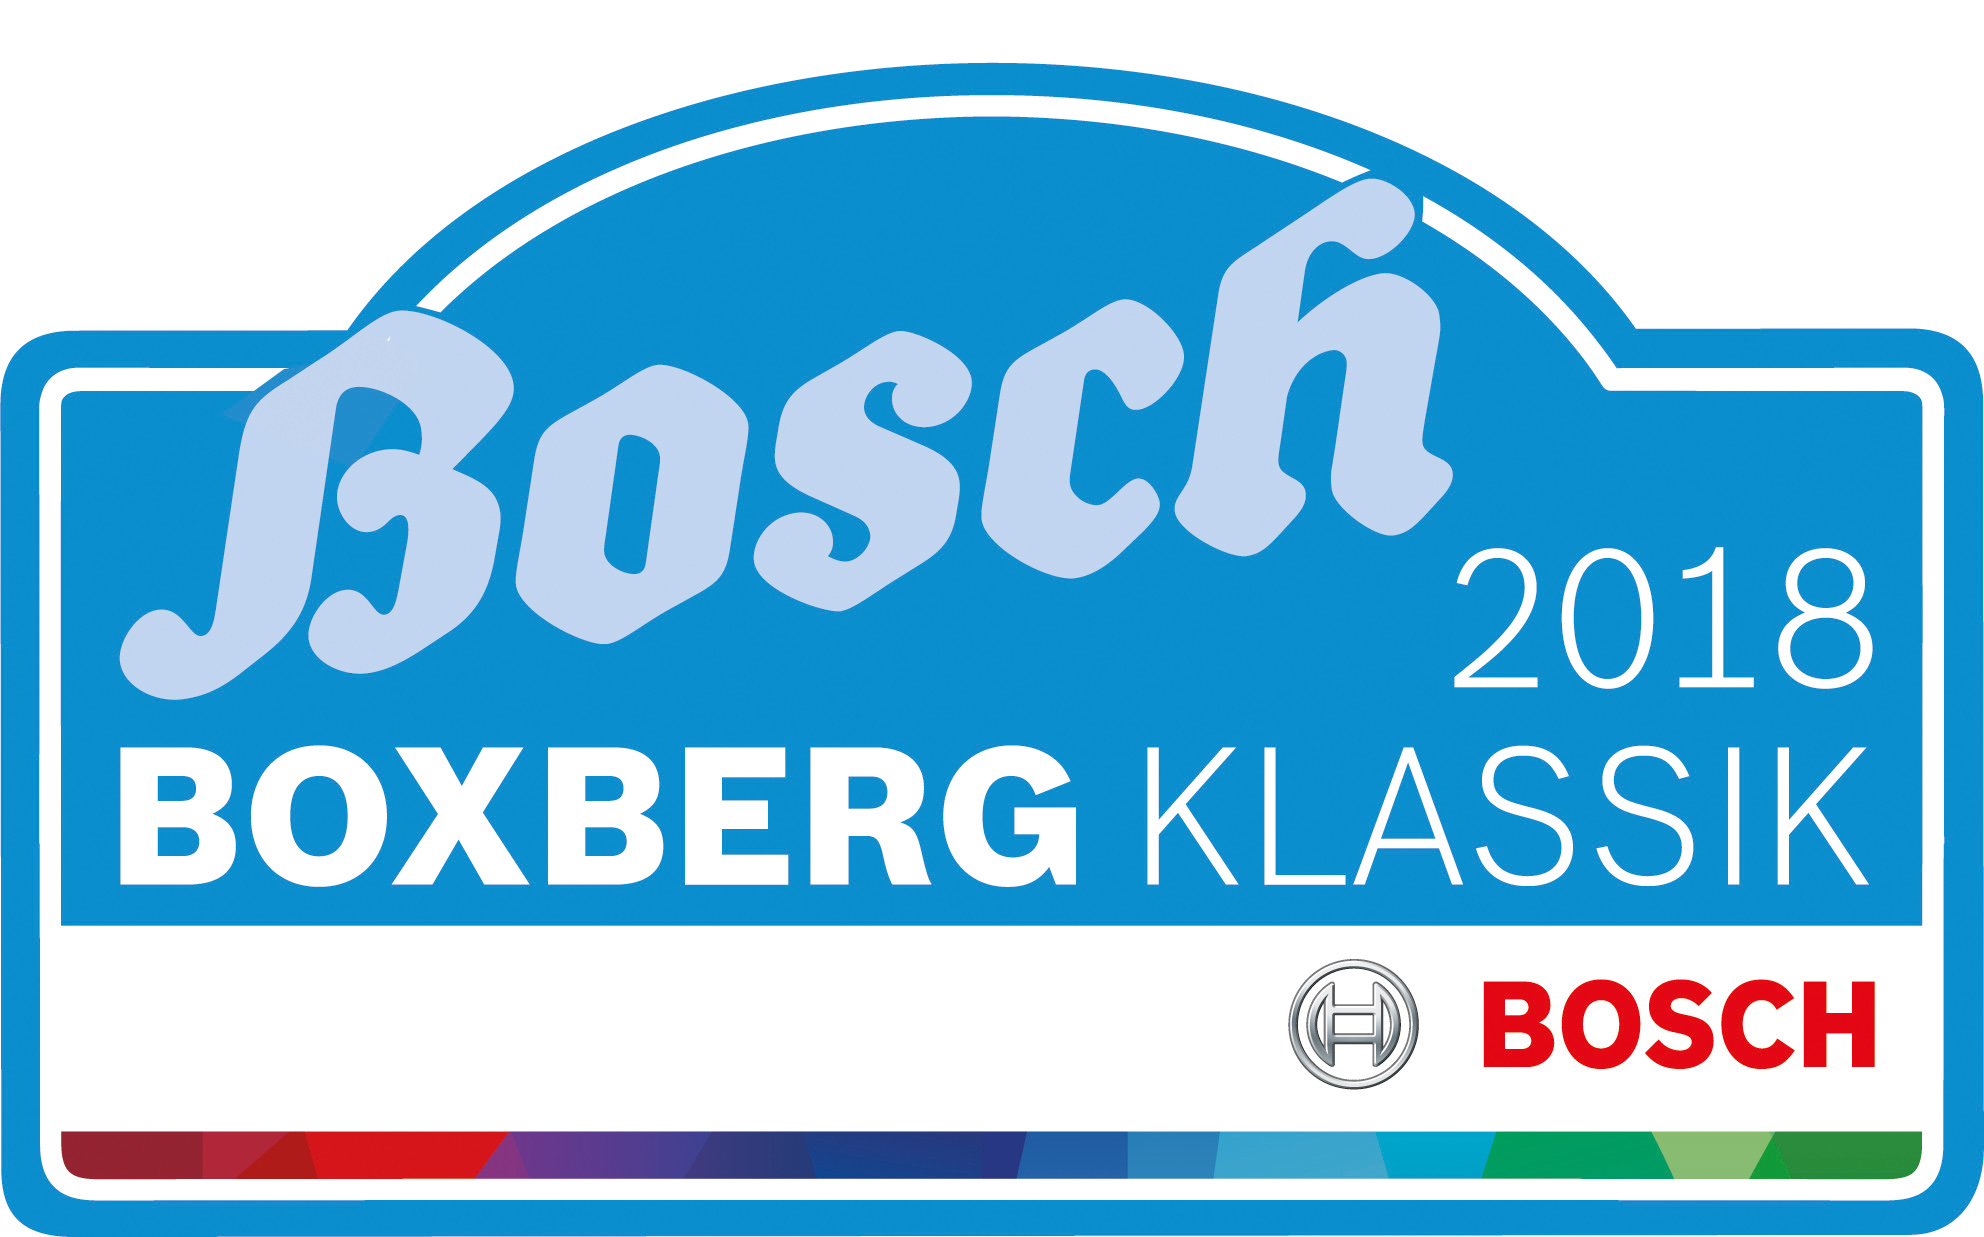 Signet Bosch Boxberg Klassik 2018